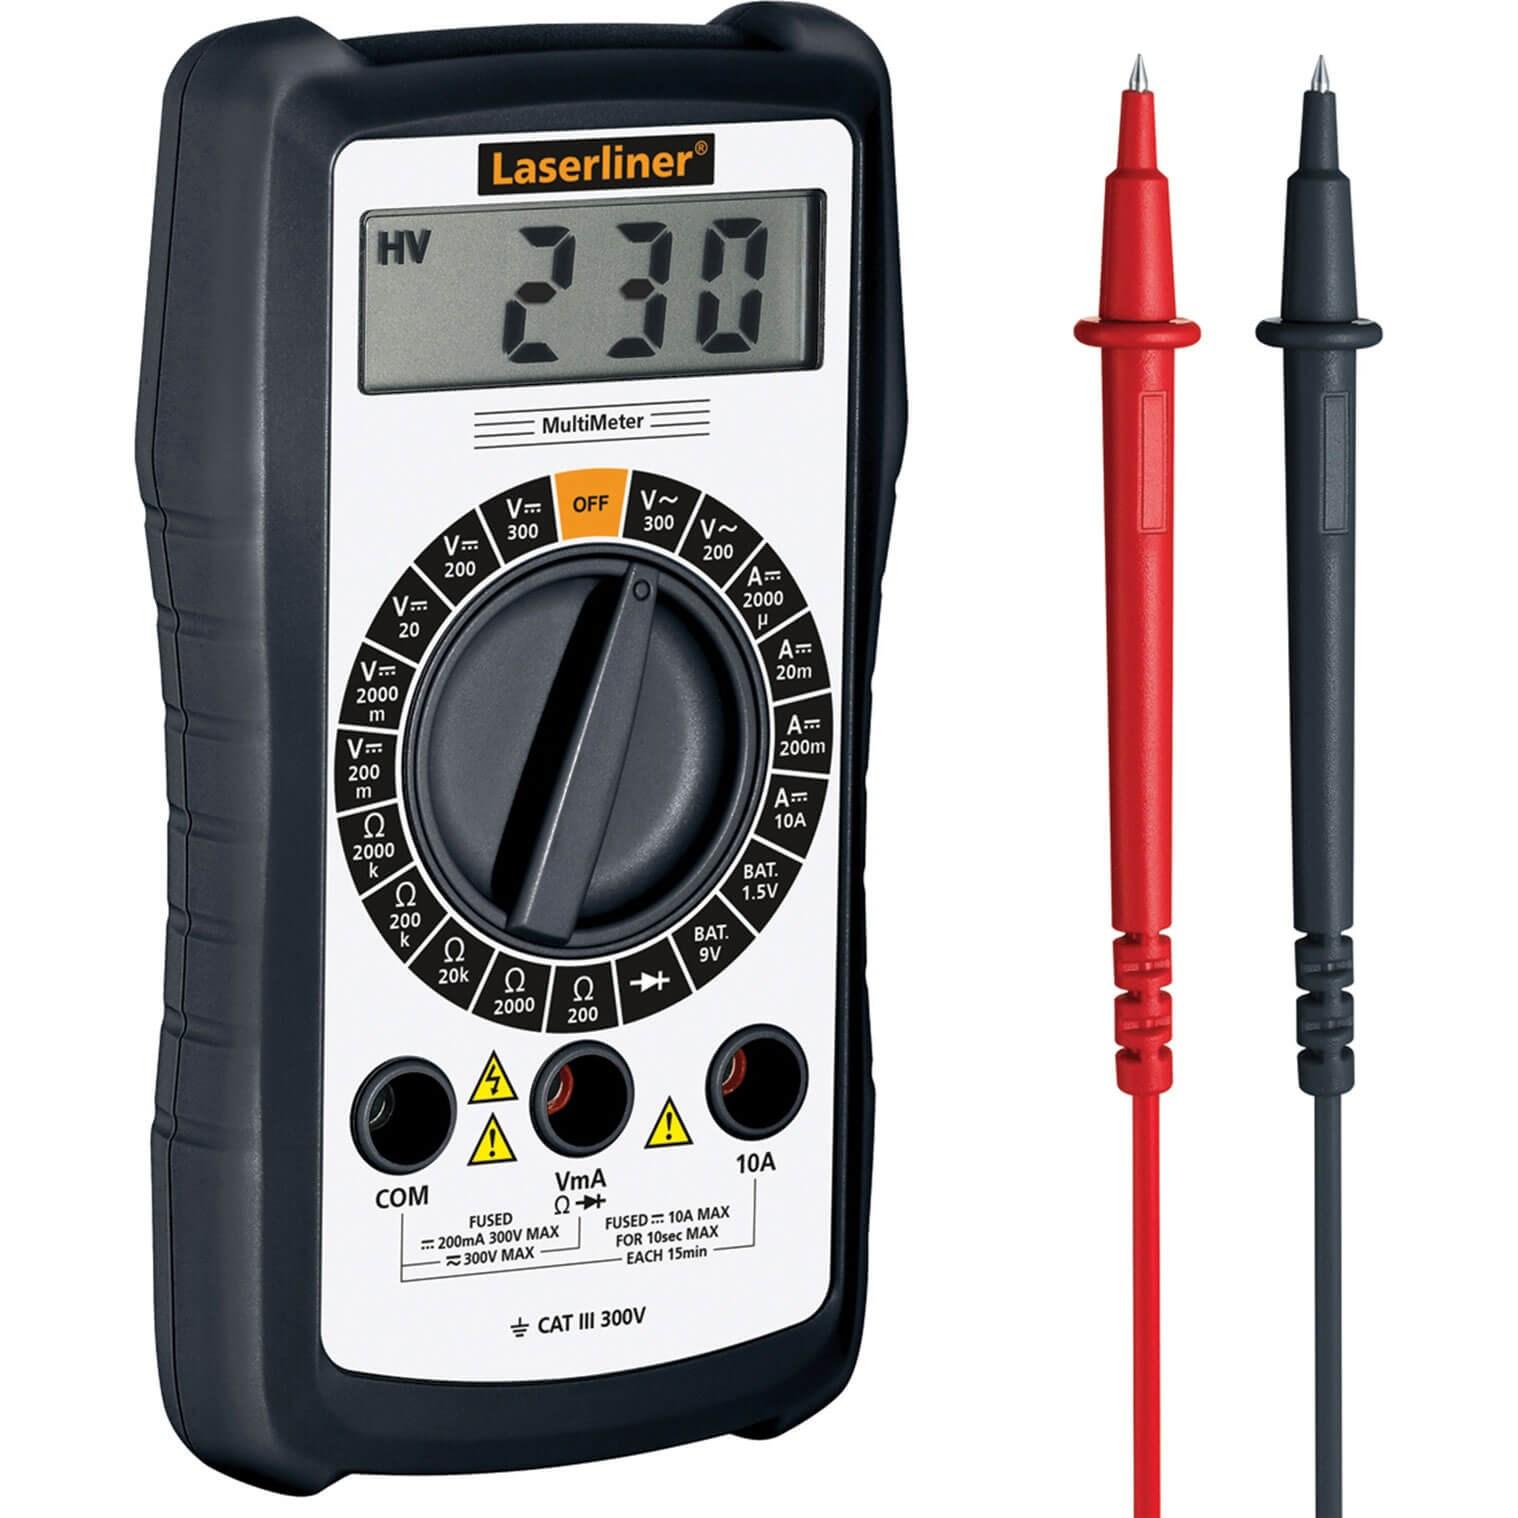 Laserliner Multimeter Digital Ac Dc Voltage Tester And Circuits